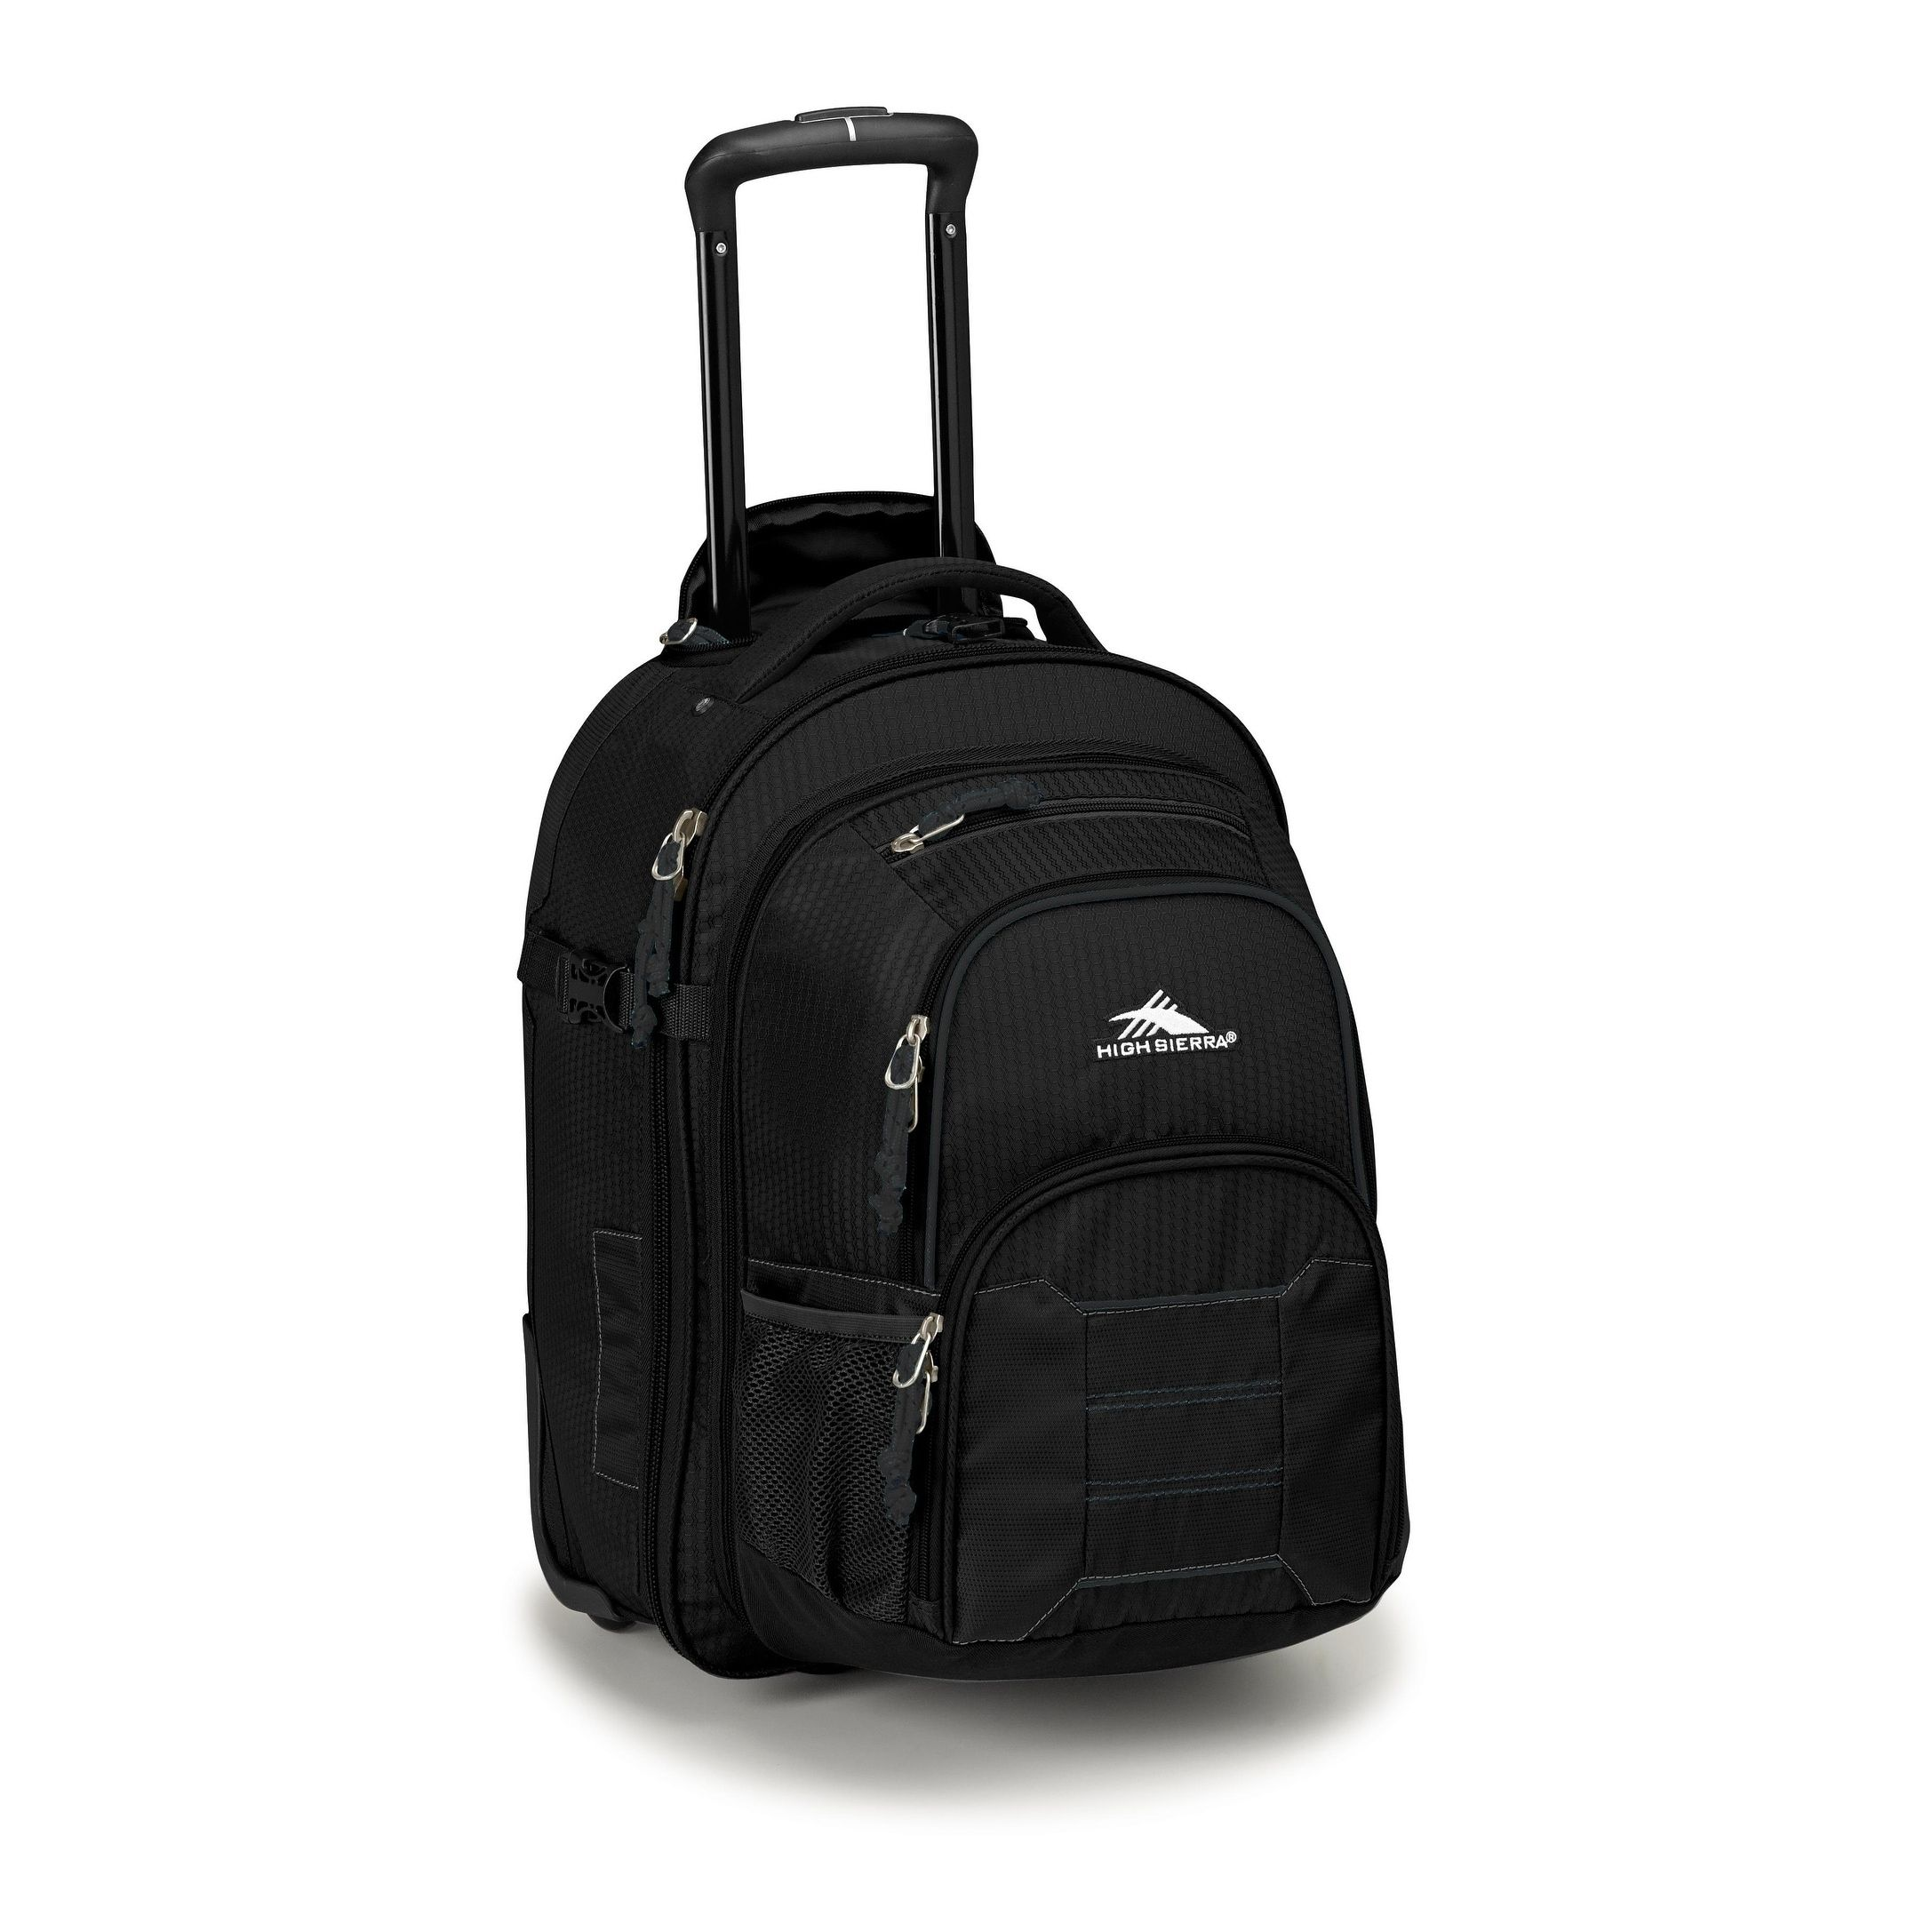 44a5abc00348 High Sierra Backpack Nz- Fenix Toulouse Handball